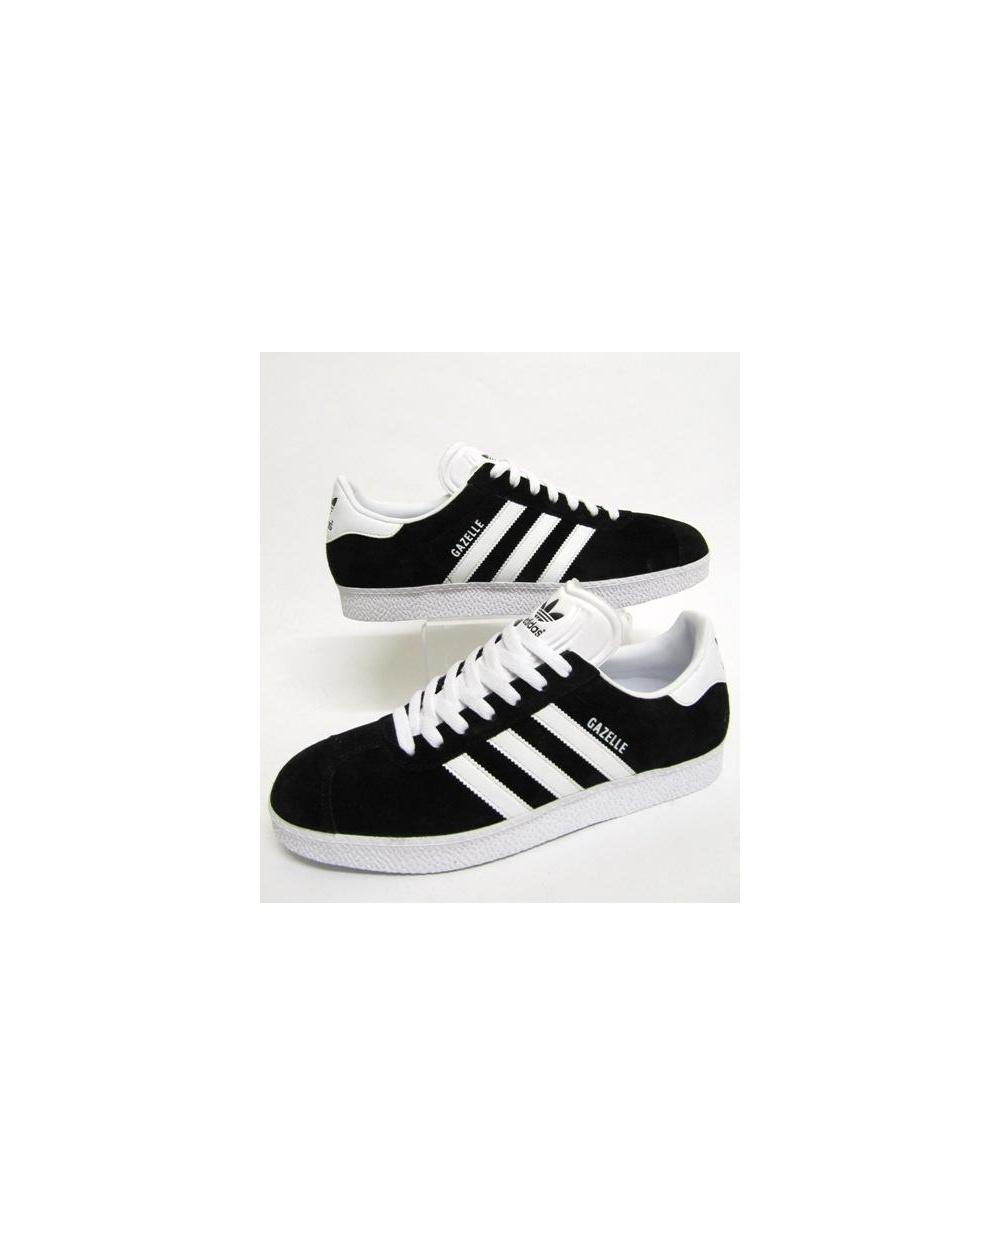 8f6764c9365 Adidas Gazelle 2 Trainers Black white